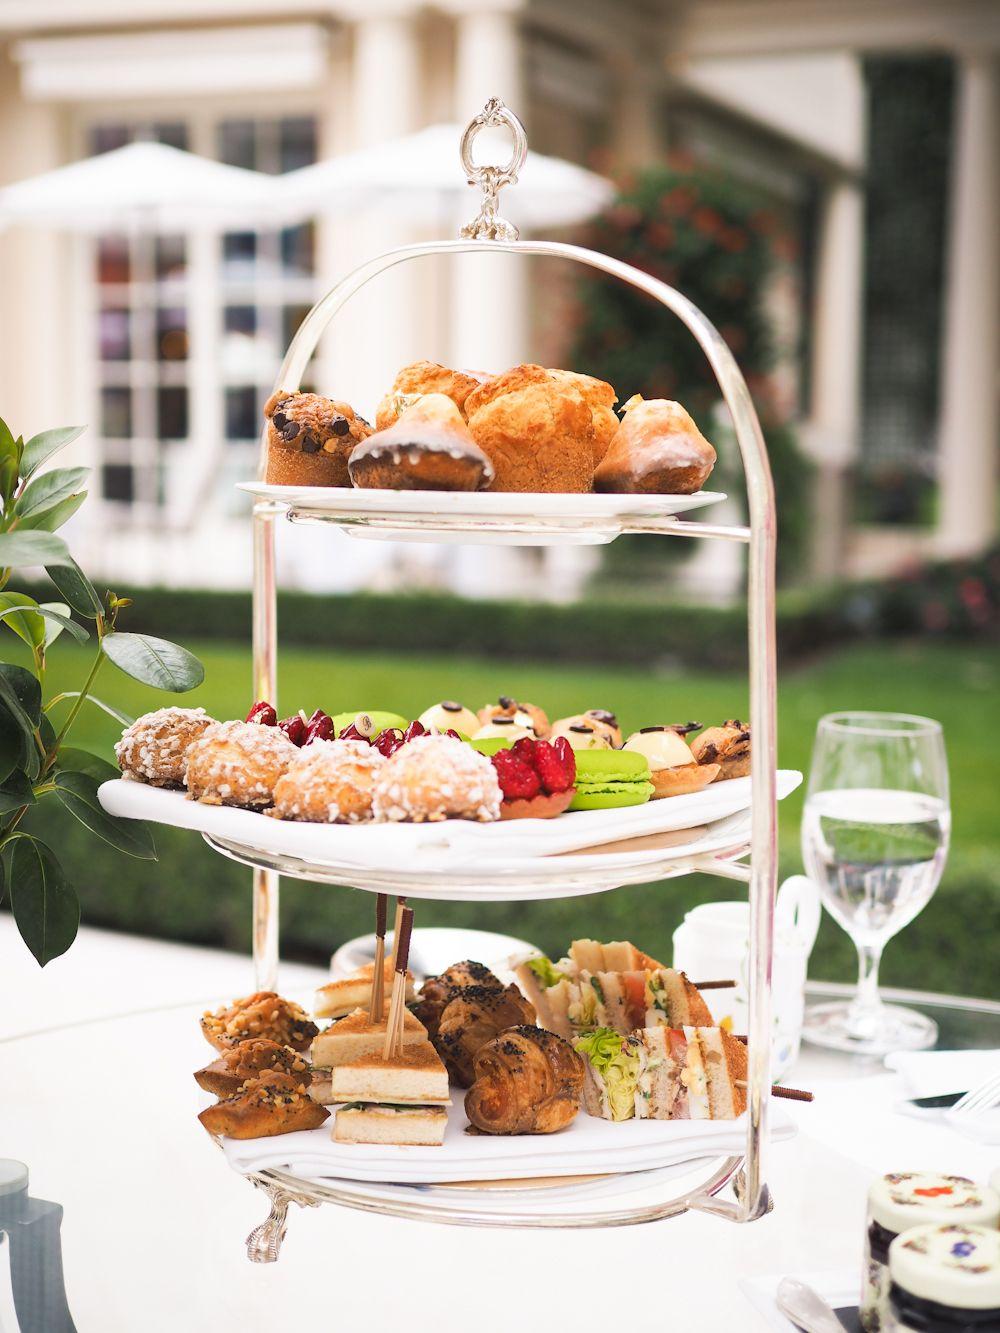 Afternoon tea at Le Bristol Hotel, Paris // In my ballerines